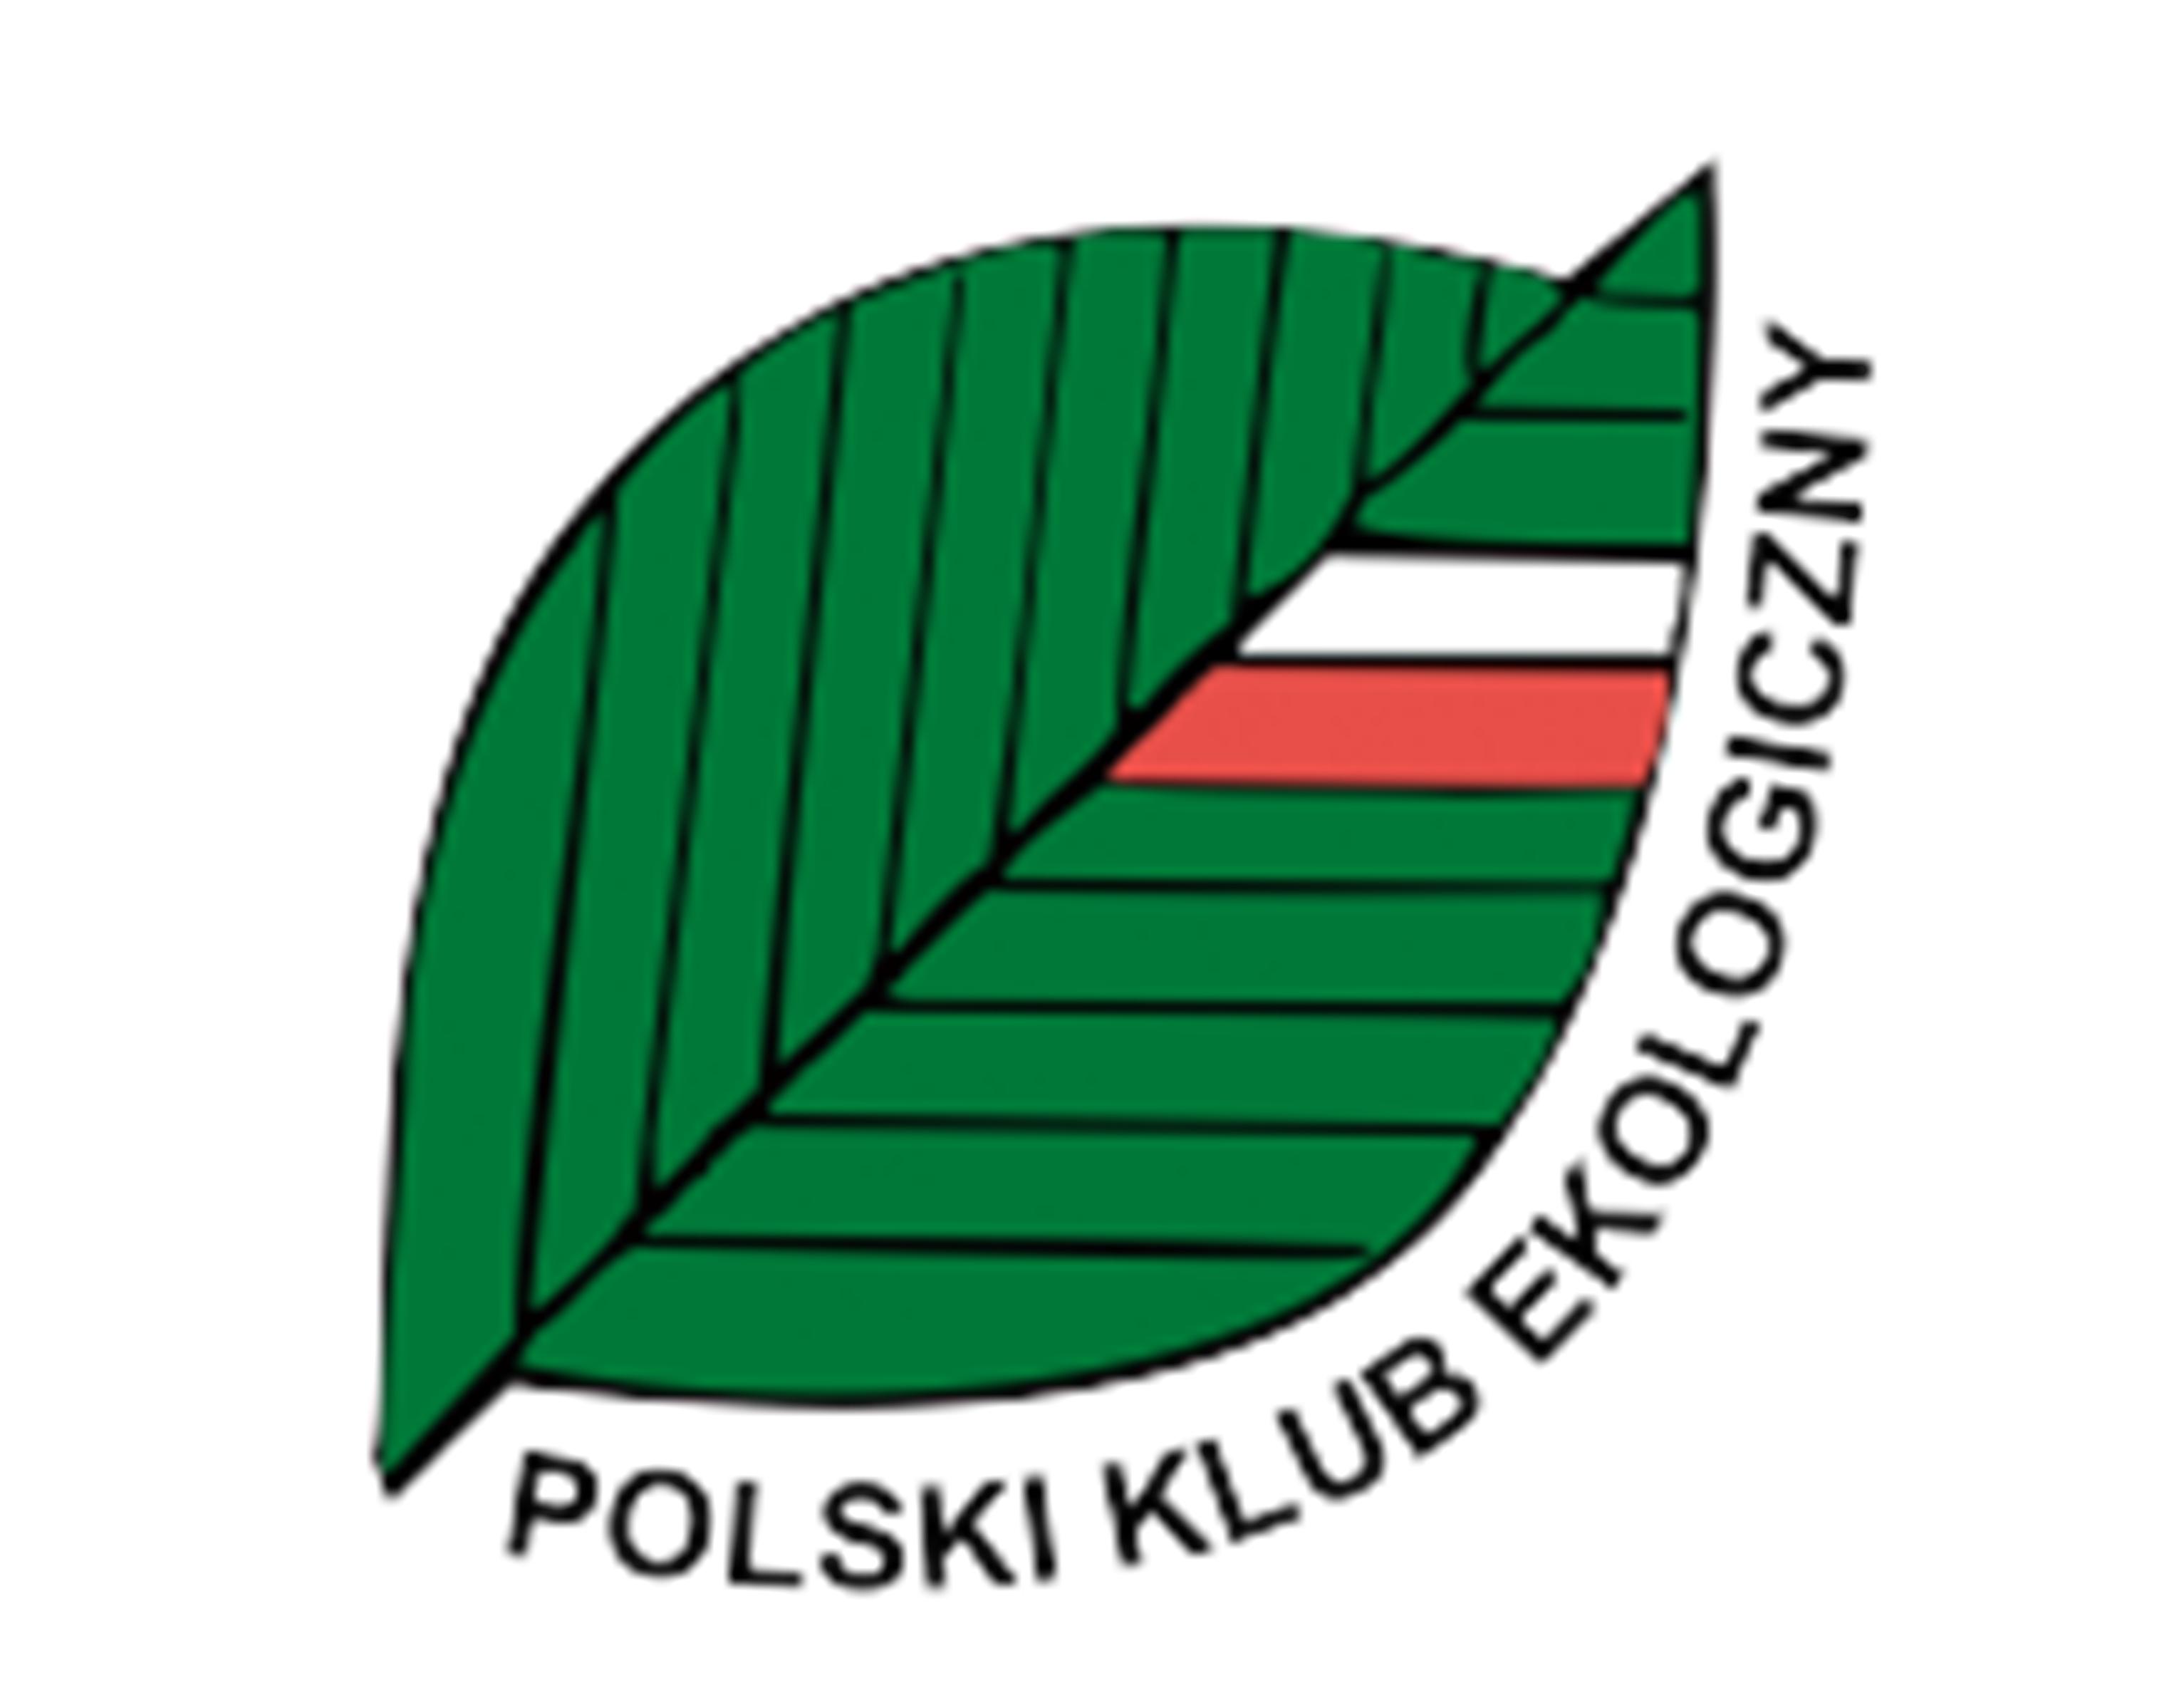 Polski Klub Ekologiczny Okręg Pomorski